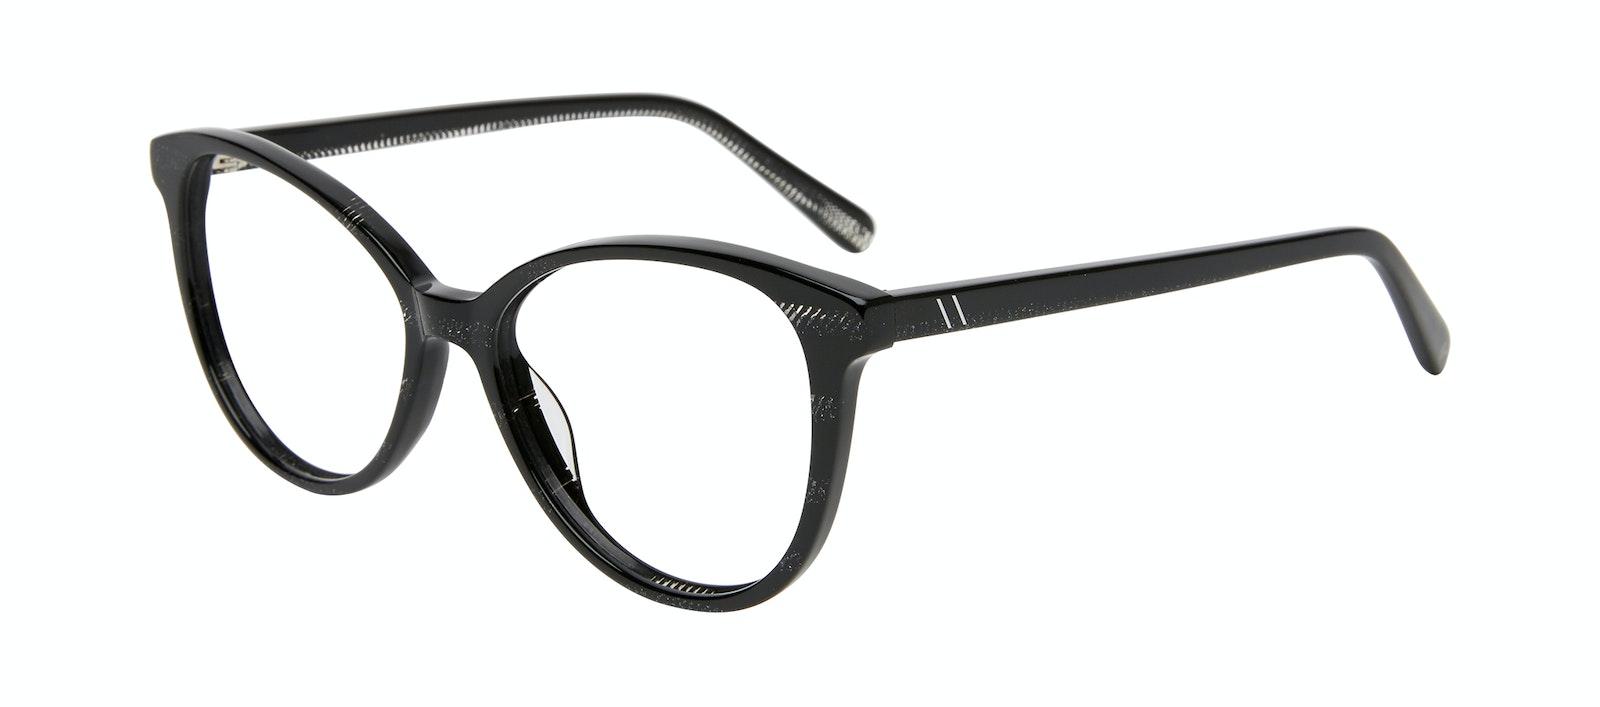 Affordable Fashion Glasses Cat Eye Eyeglasses Women Esprit Night Tilt